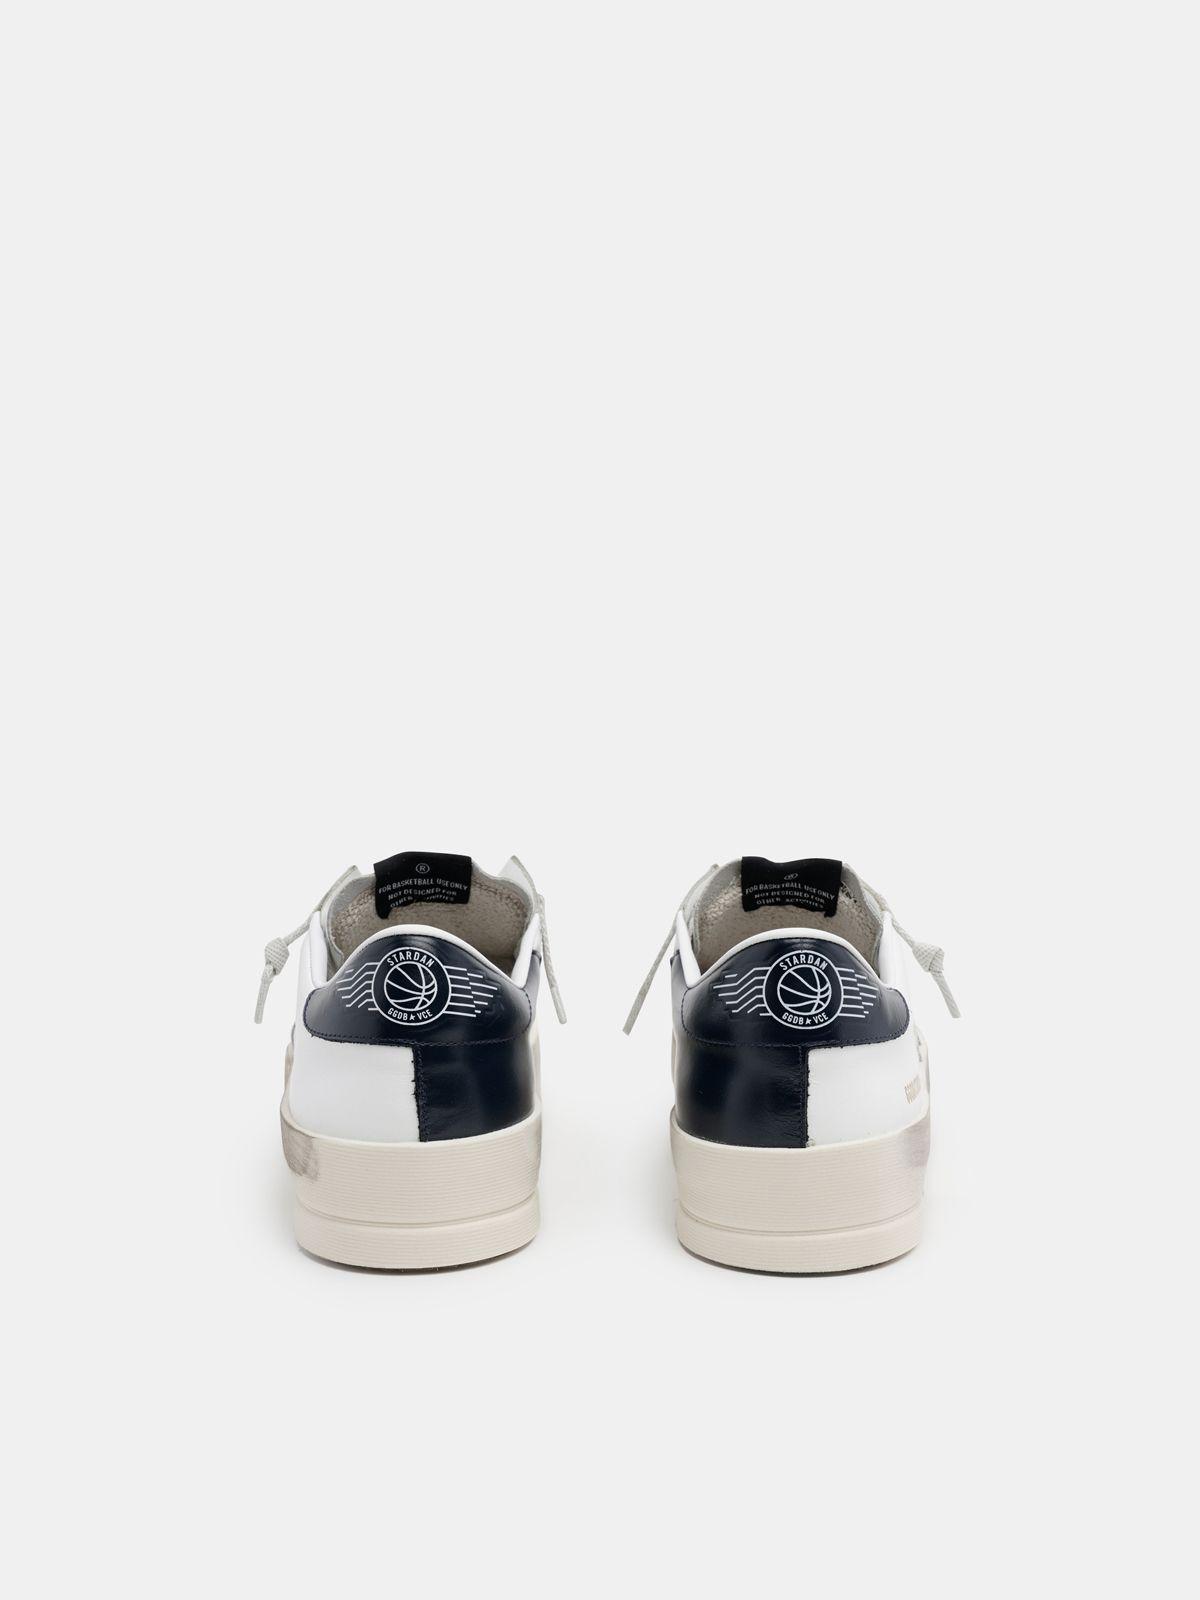 Golden Goose - Black and white Stardan sneakers in